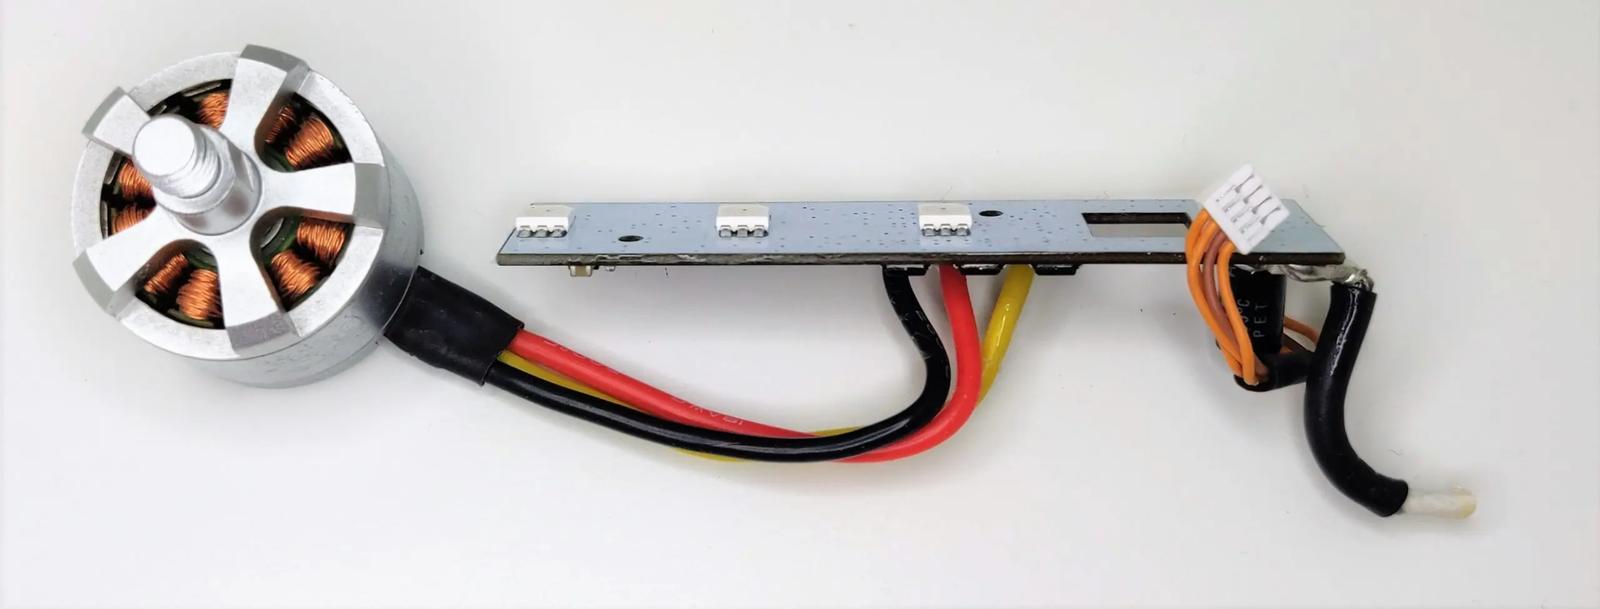 DJI Phantom 2 (Vision Plus) Counter Clockwise CCW Motor + ESC – Silver V1